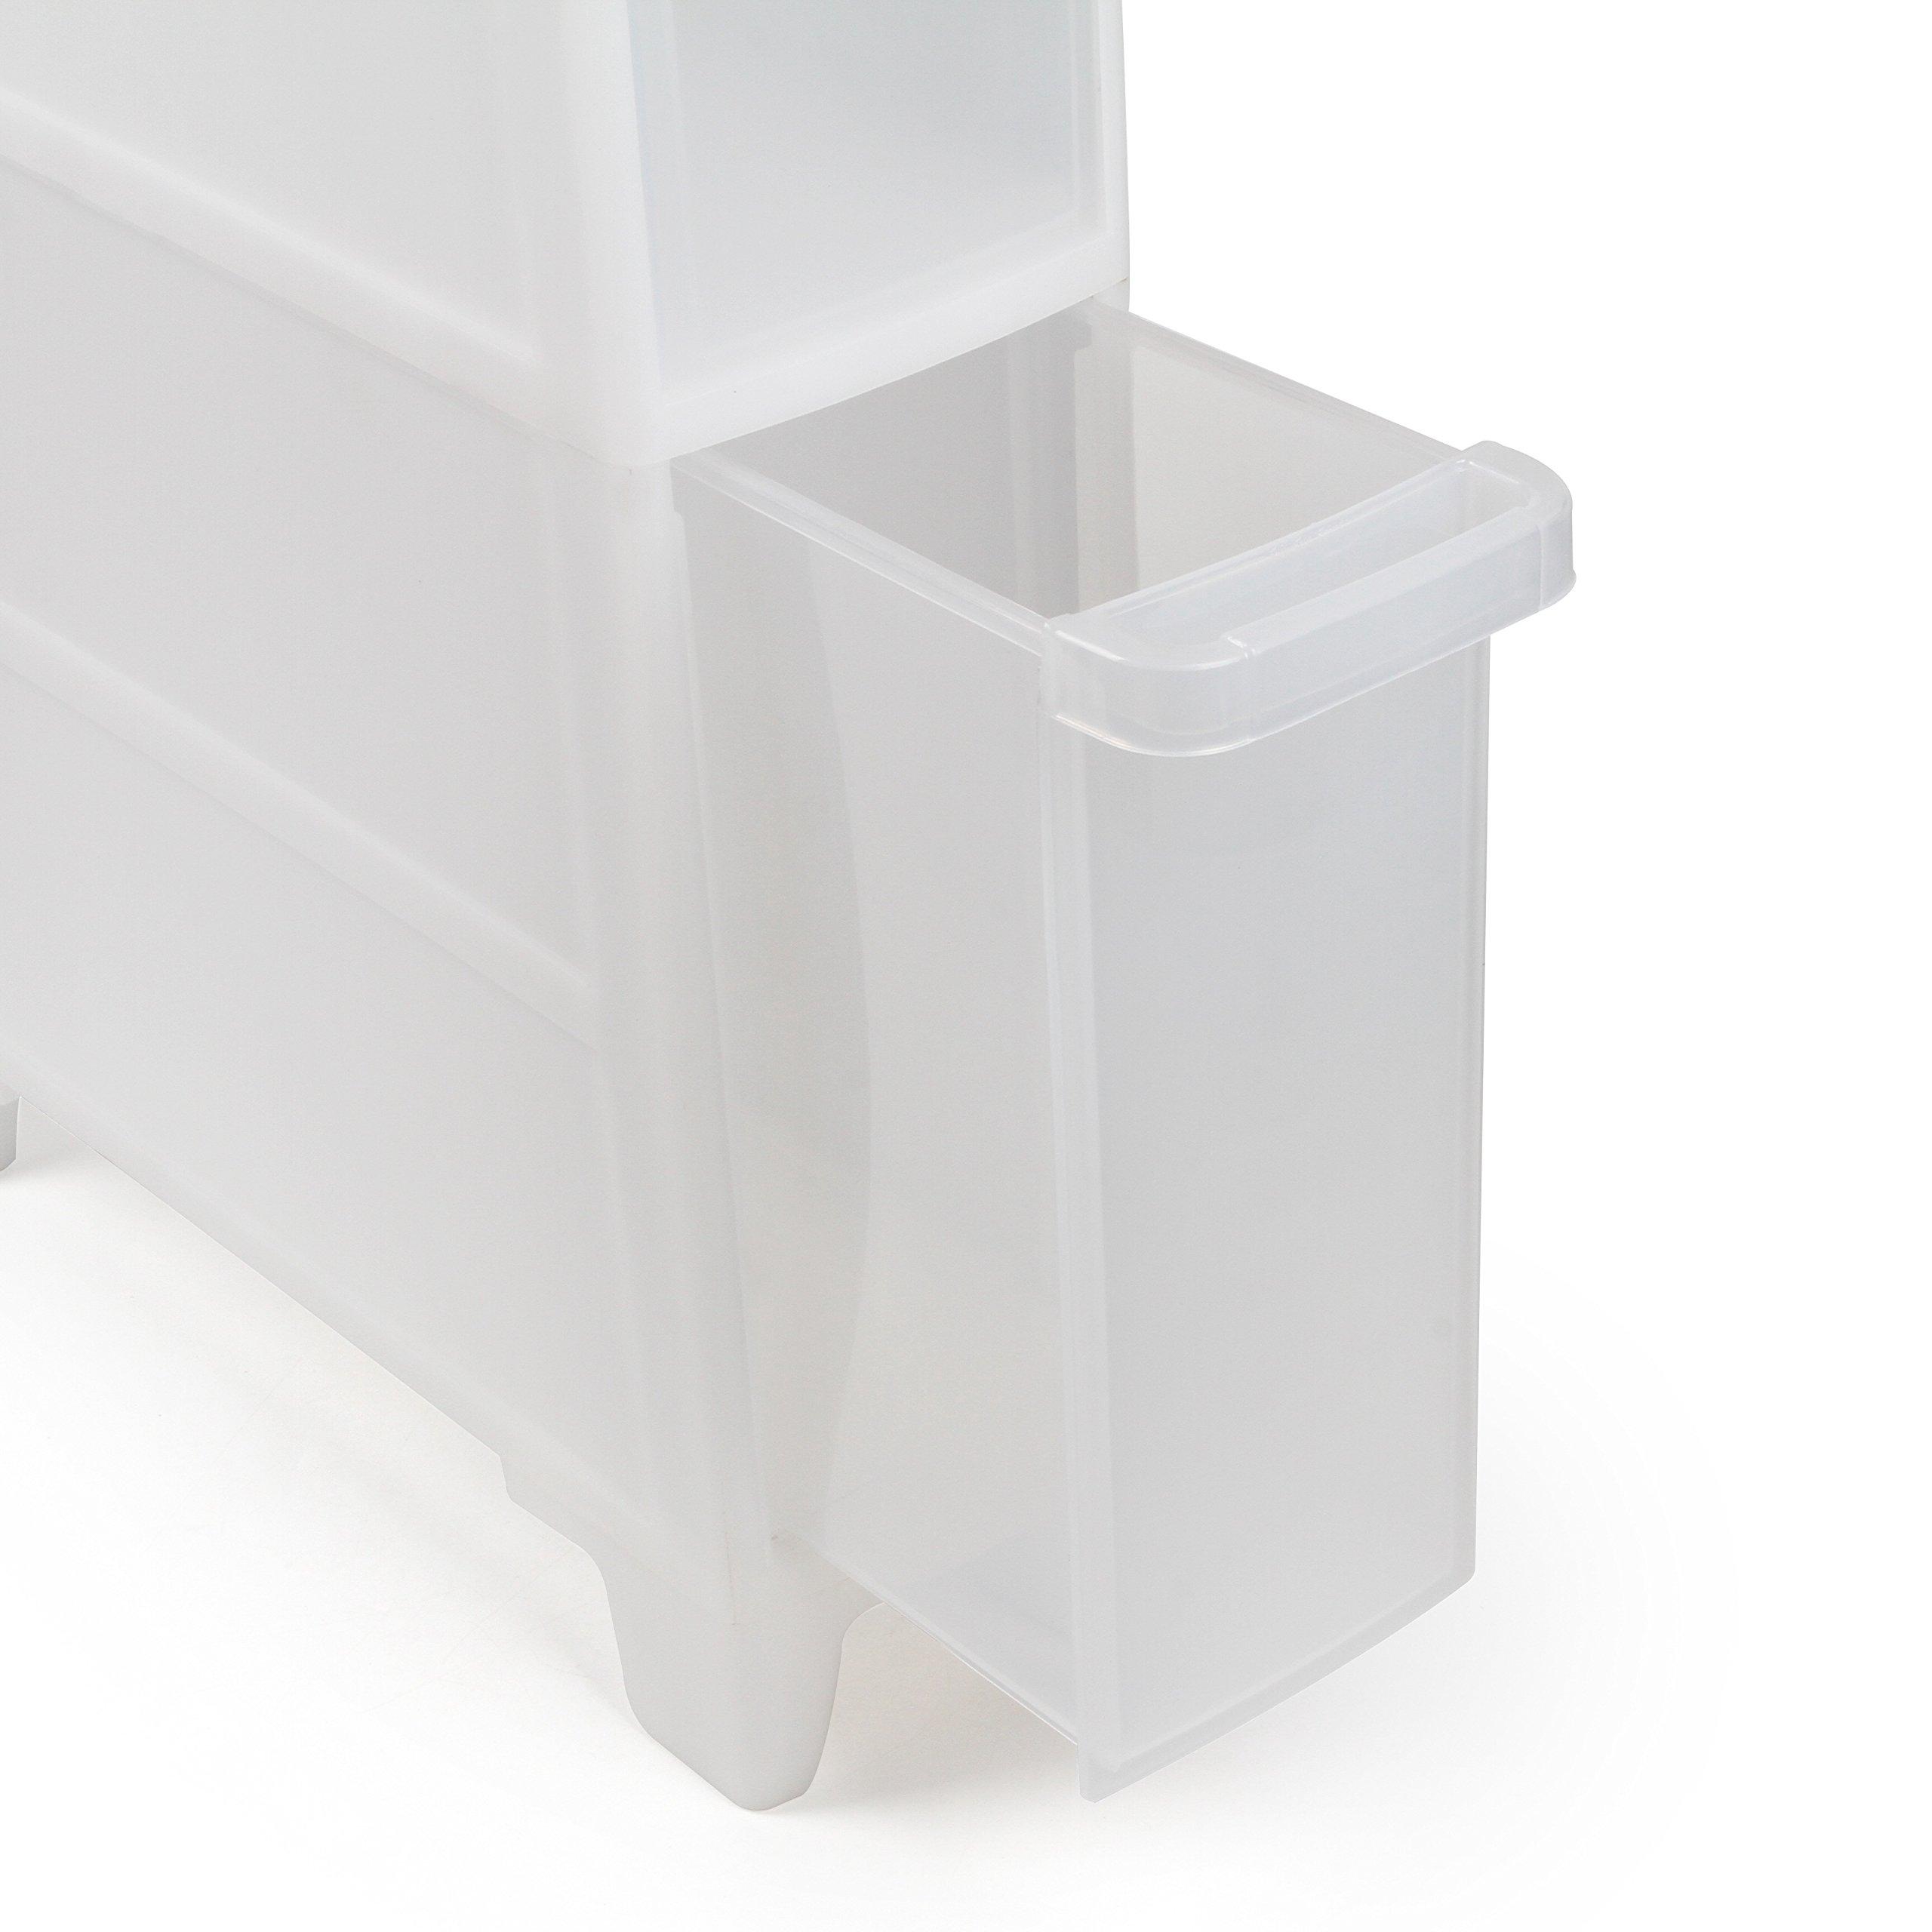 Asvert 4 Tier Storage Cart Slide Out Drawer Tower for Laundry Bedroom Bathroom Kitchen